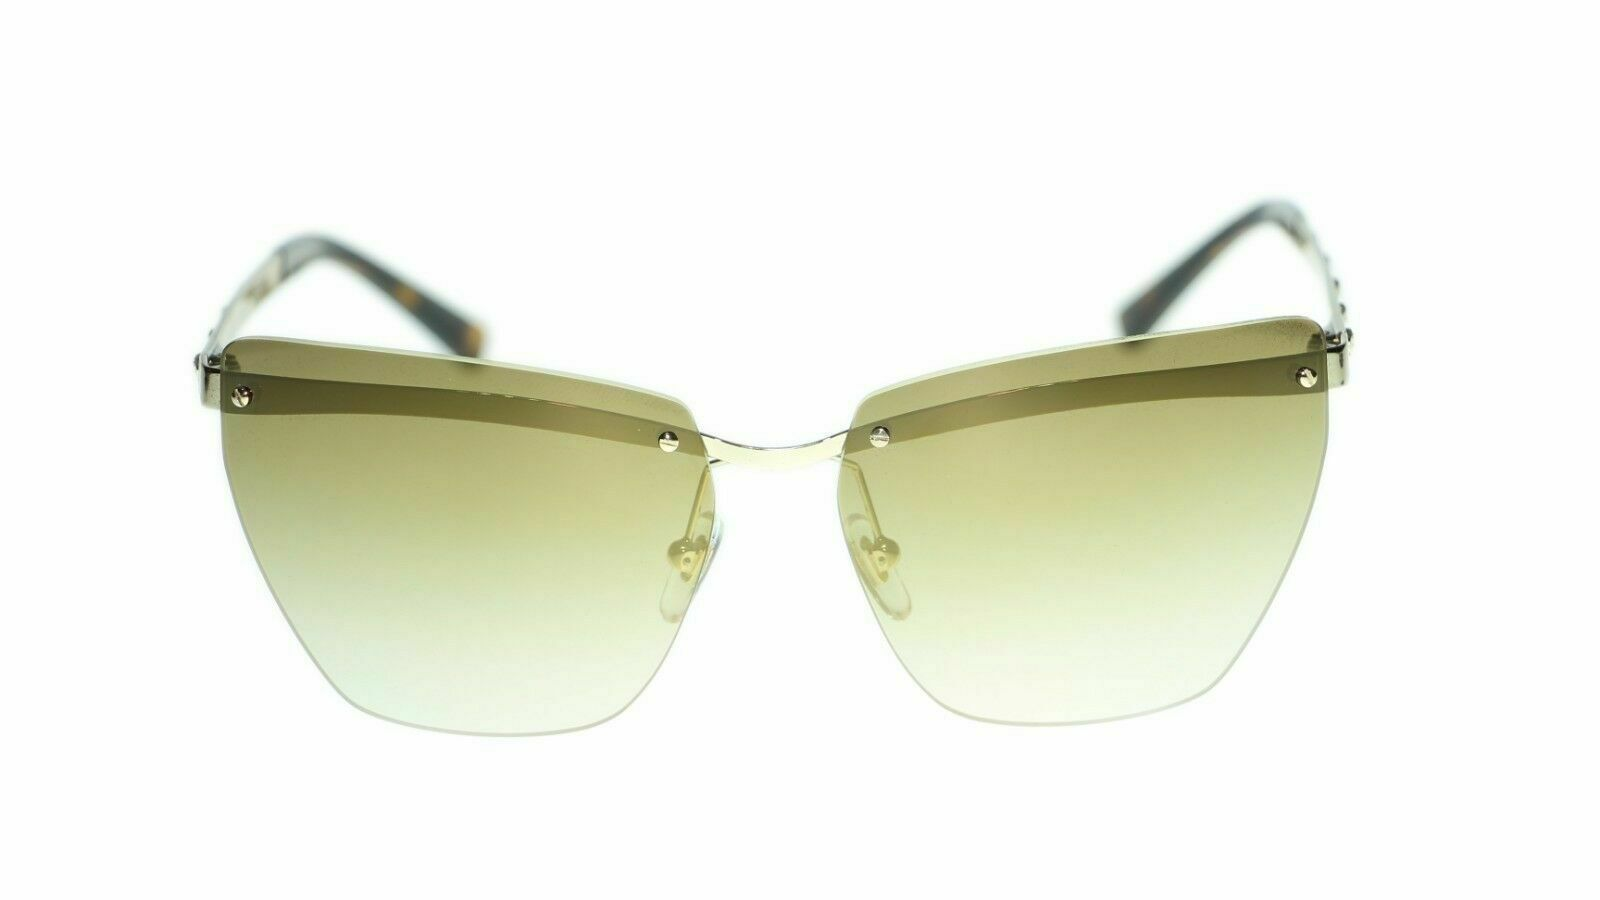 Versace Sunglasses VE2190 Pale Gold Gray Gradient 125211 Authentic New